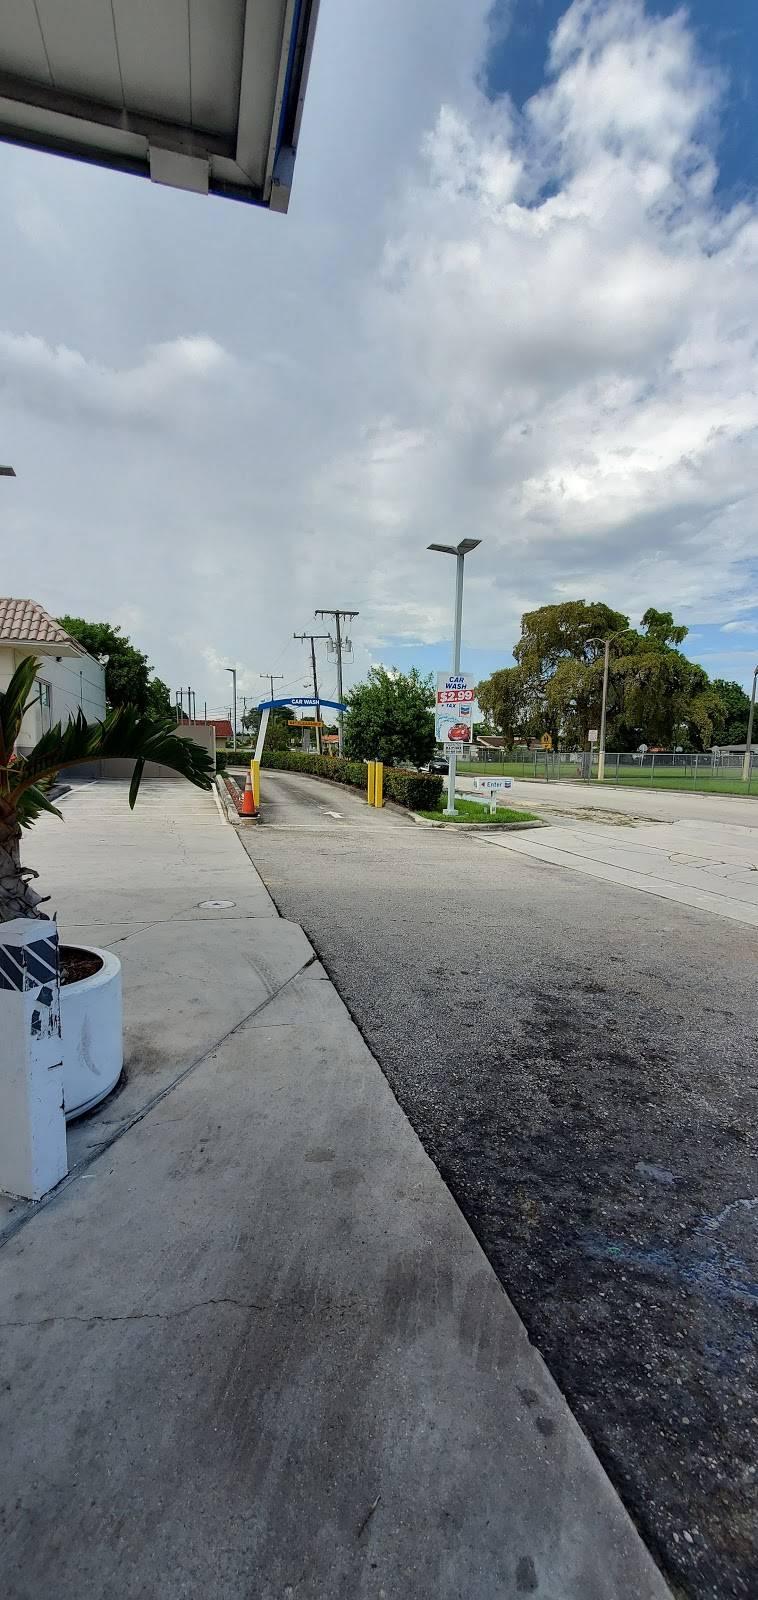 Chevron - gas station  | Photo 7 of 8 | Address: 6901 Coral Way, Miami, FL 33155, USA | Phone: (305) 265-9990